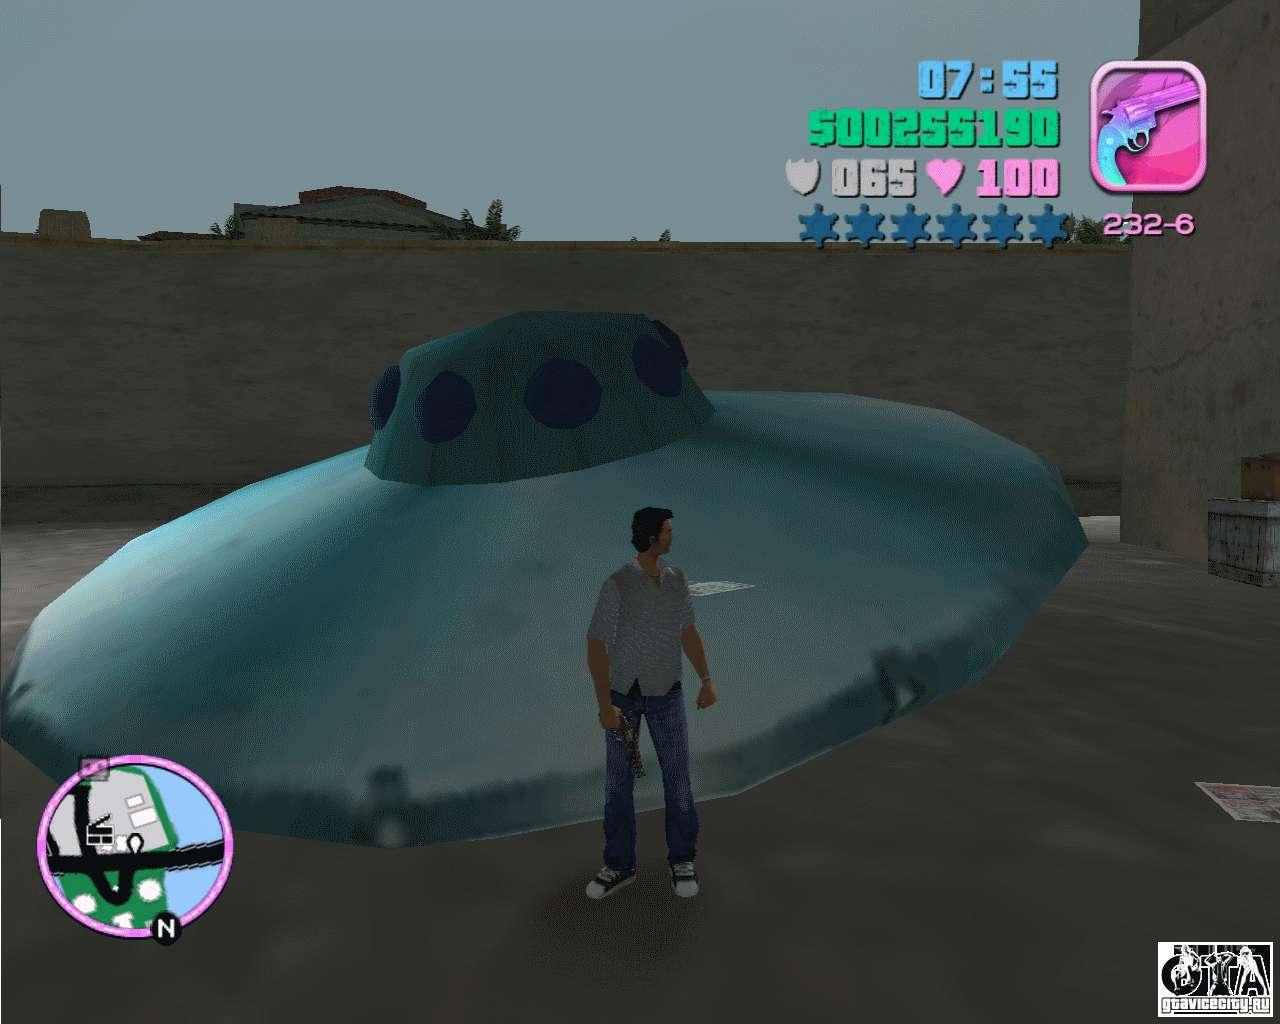 Grand Theft Auto San Andreas Mod Apk Revdl ✓ The Mercedes Benz